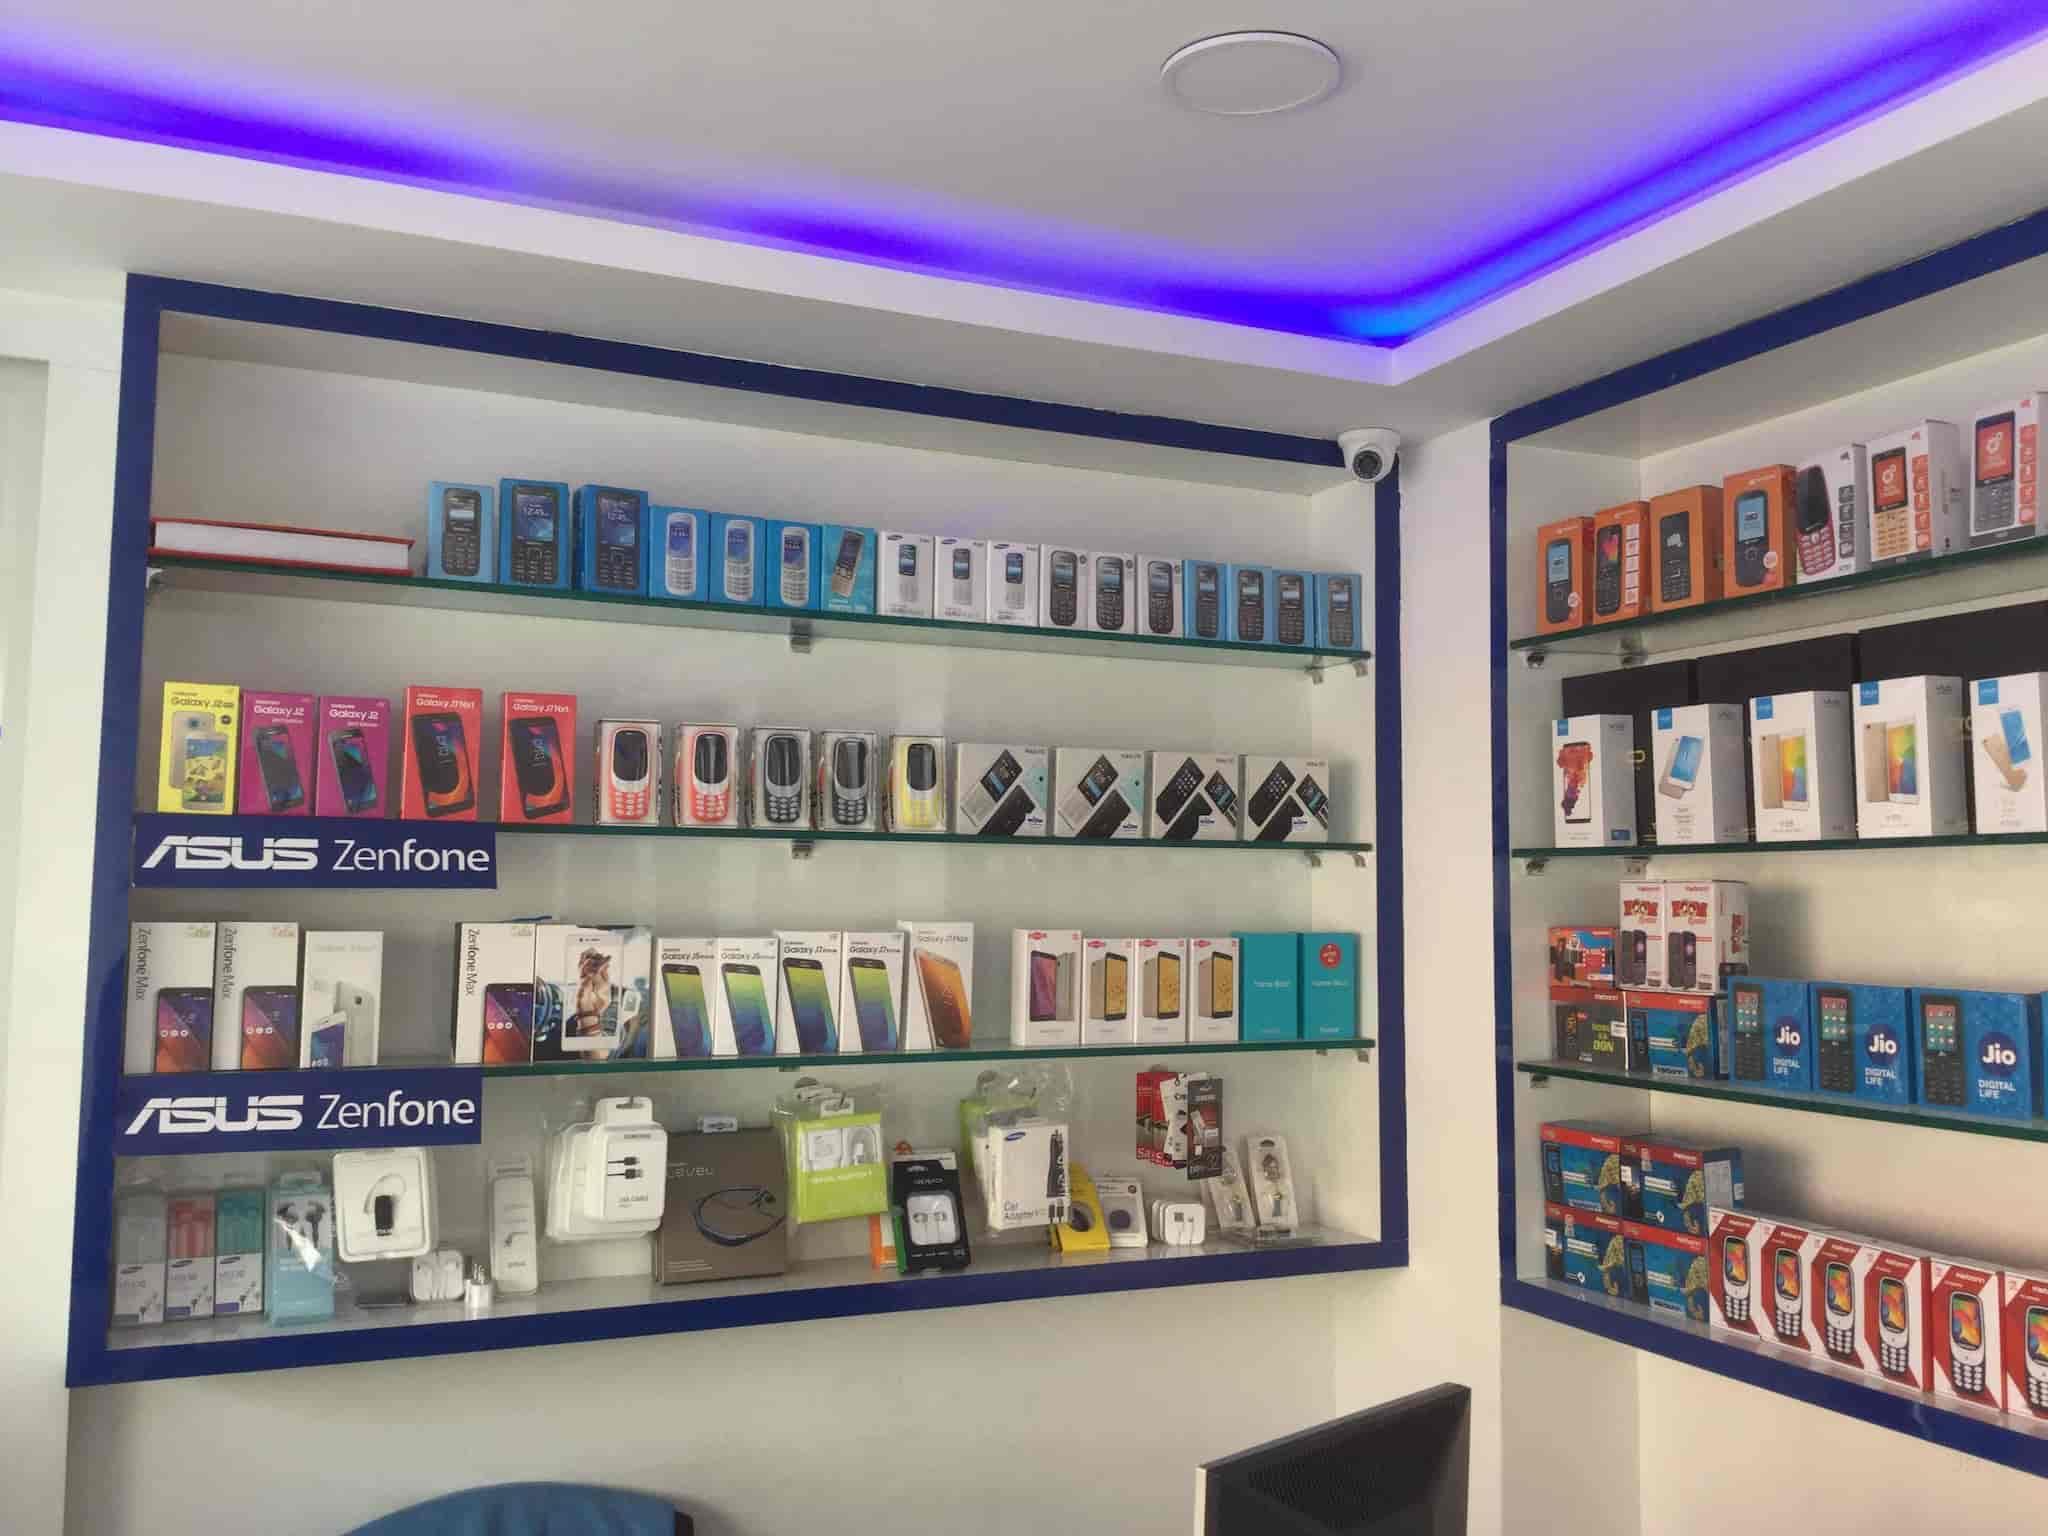 The Mobile Shop 3s Communications, Doddamavalli - Mobile